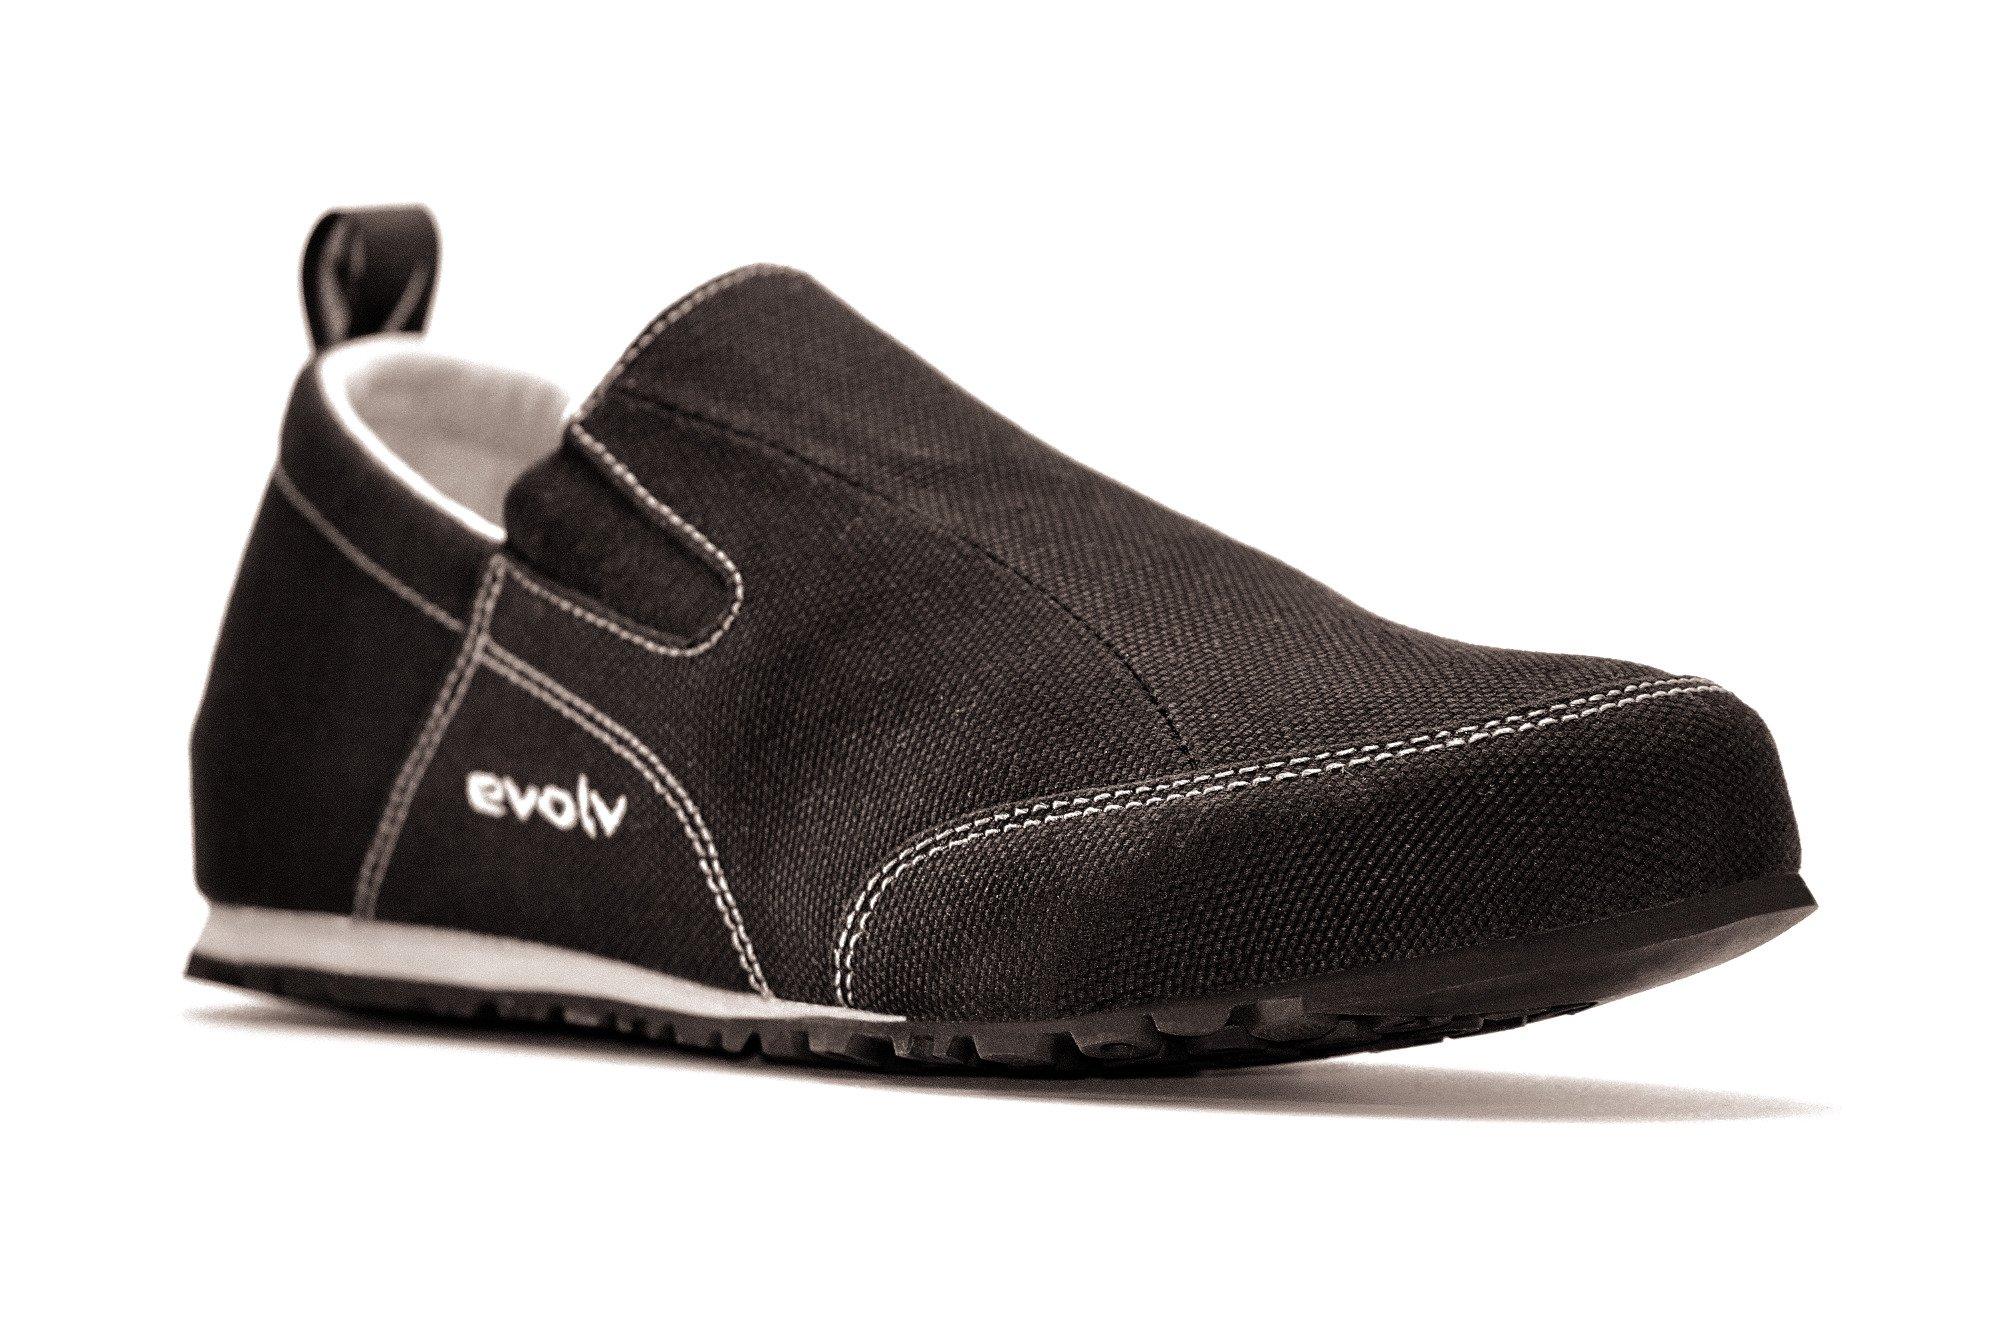 Evolv Cruzer Slip-on Approach Shoe - Black 13 by Evolv (Image #5)